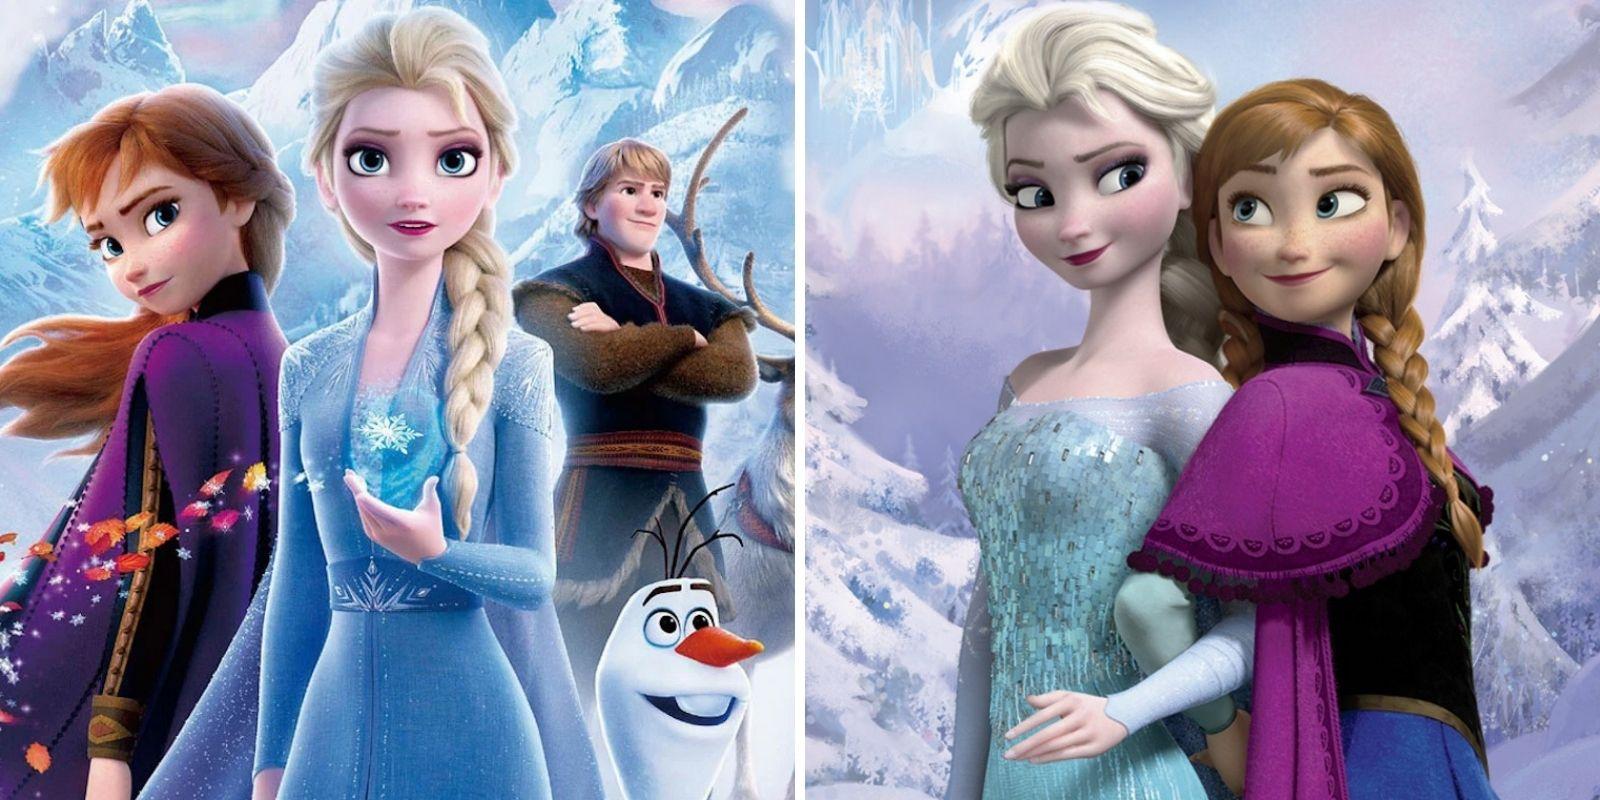 5 Ways Frozen 2 Is Better Than The Original 5 Ways The Original Is Best